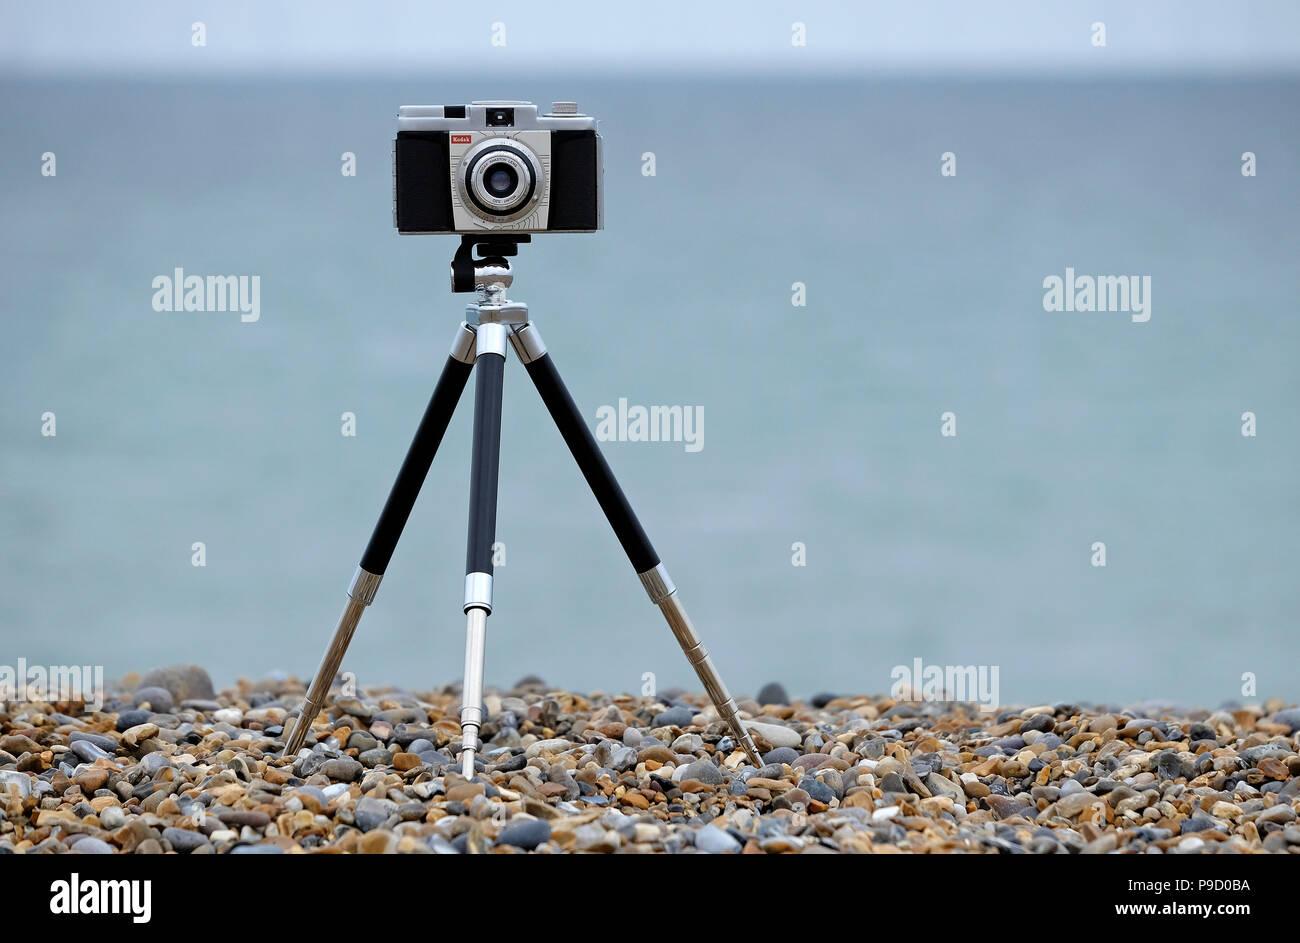 vintage retro film camera and metal telescopic tripod on shingle beach, north norfolk, england Stock Photo